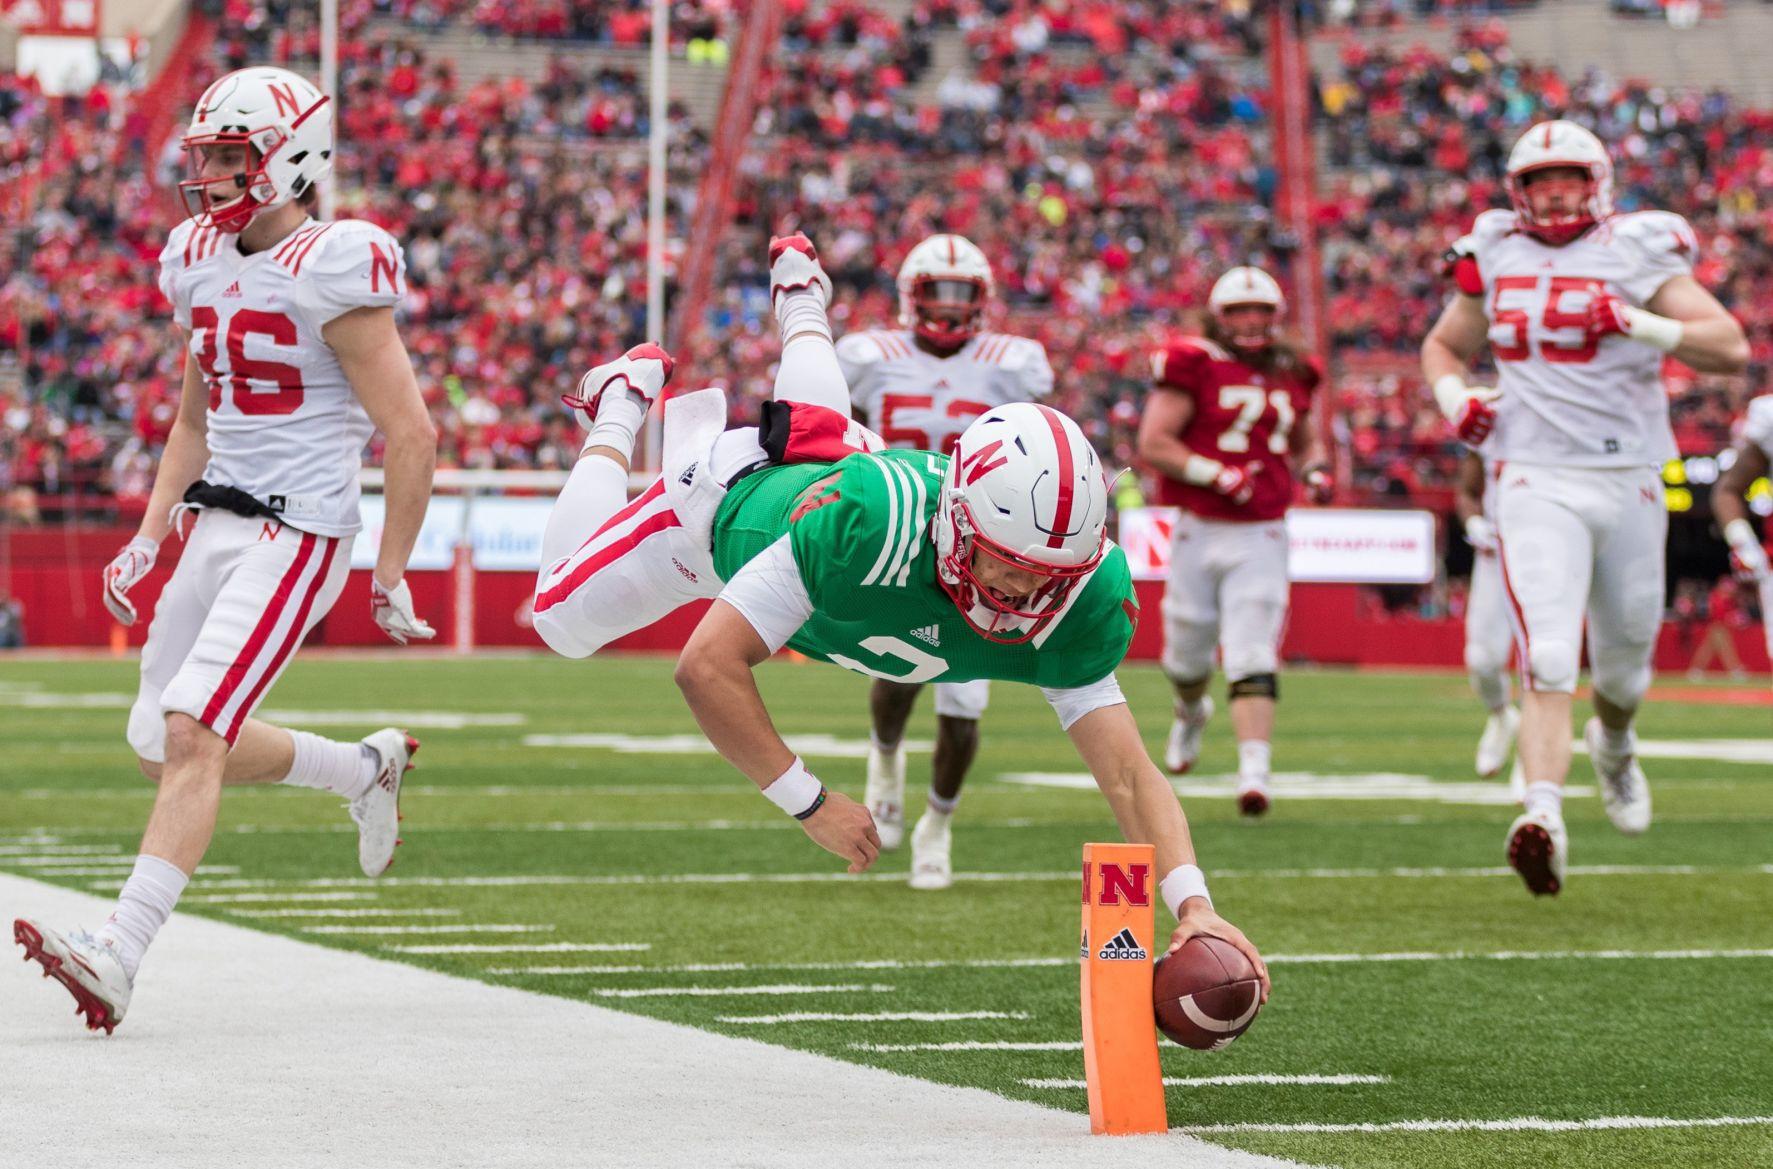 McKewon: Nebraska's return to greatness dependent on emergence of elite quarterback | Omaha.com